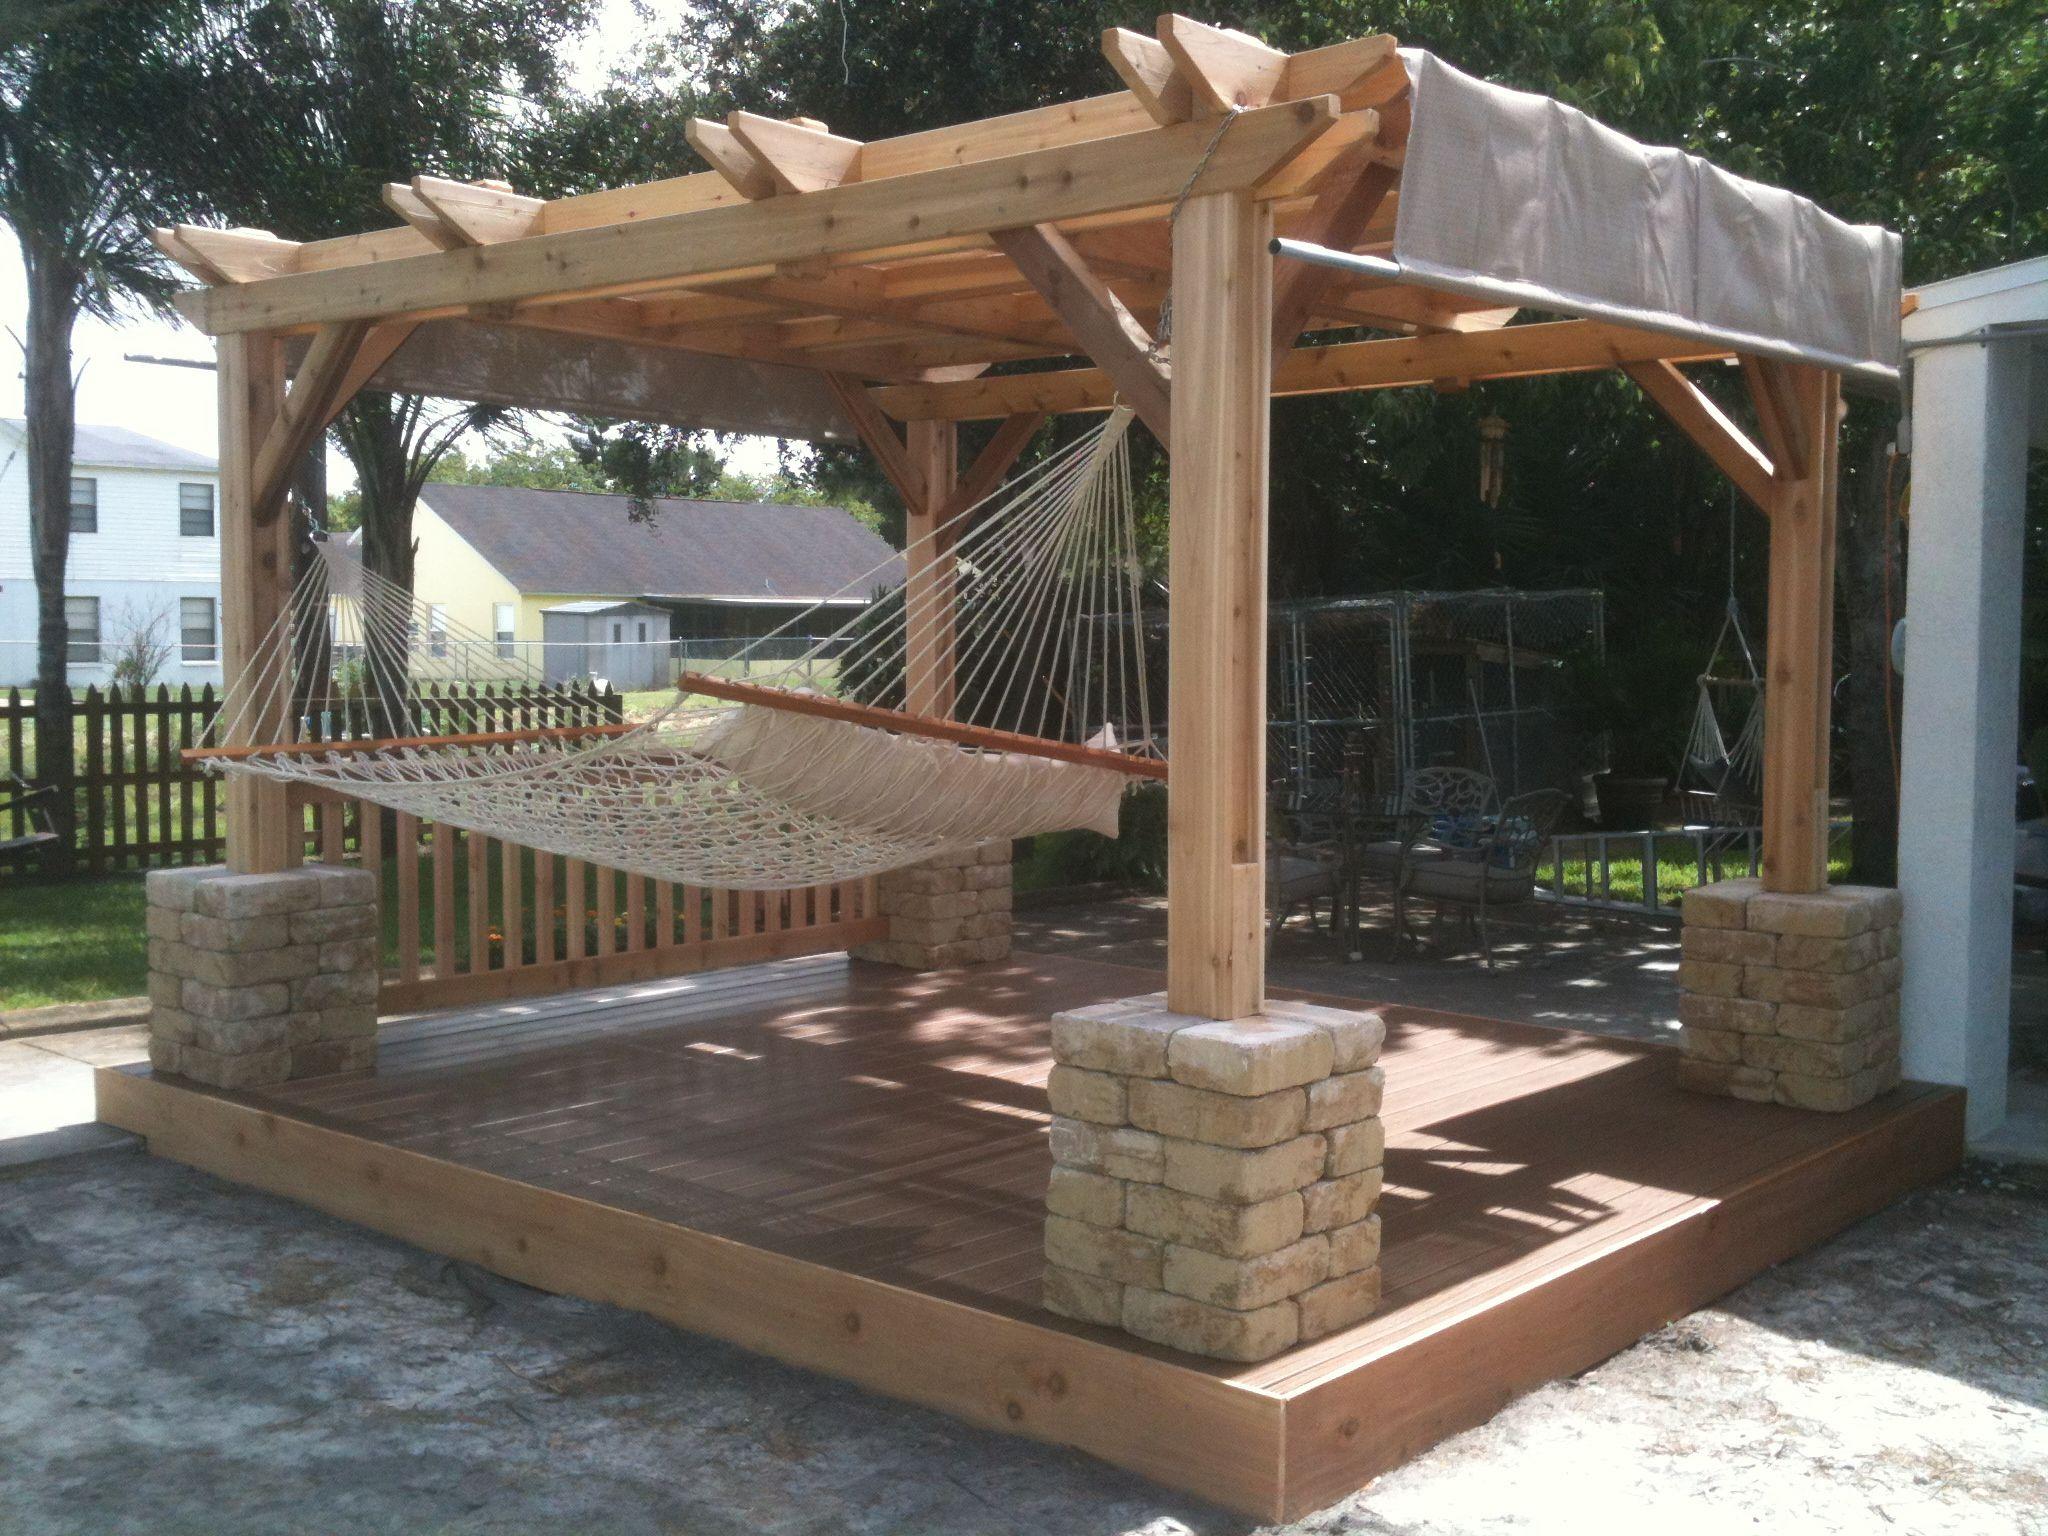 Comfy backyard hammock decor ideas 40